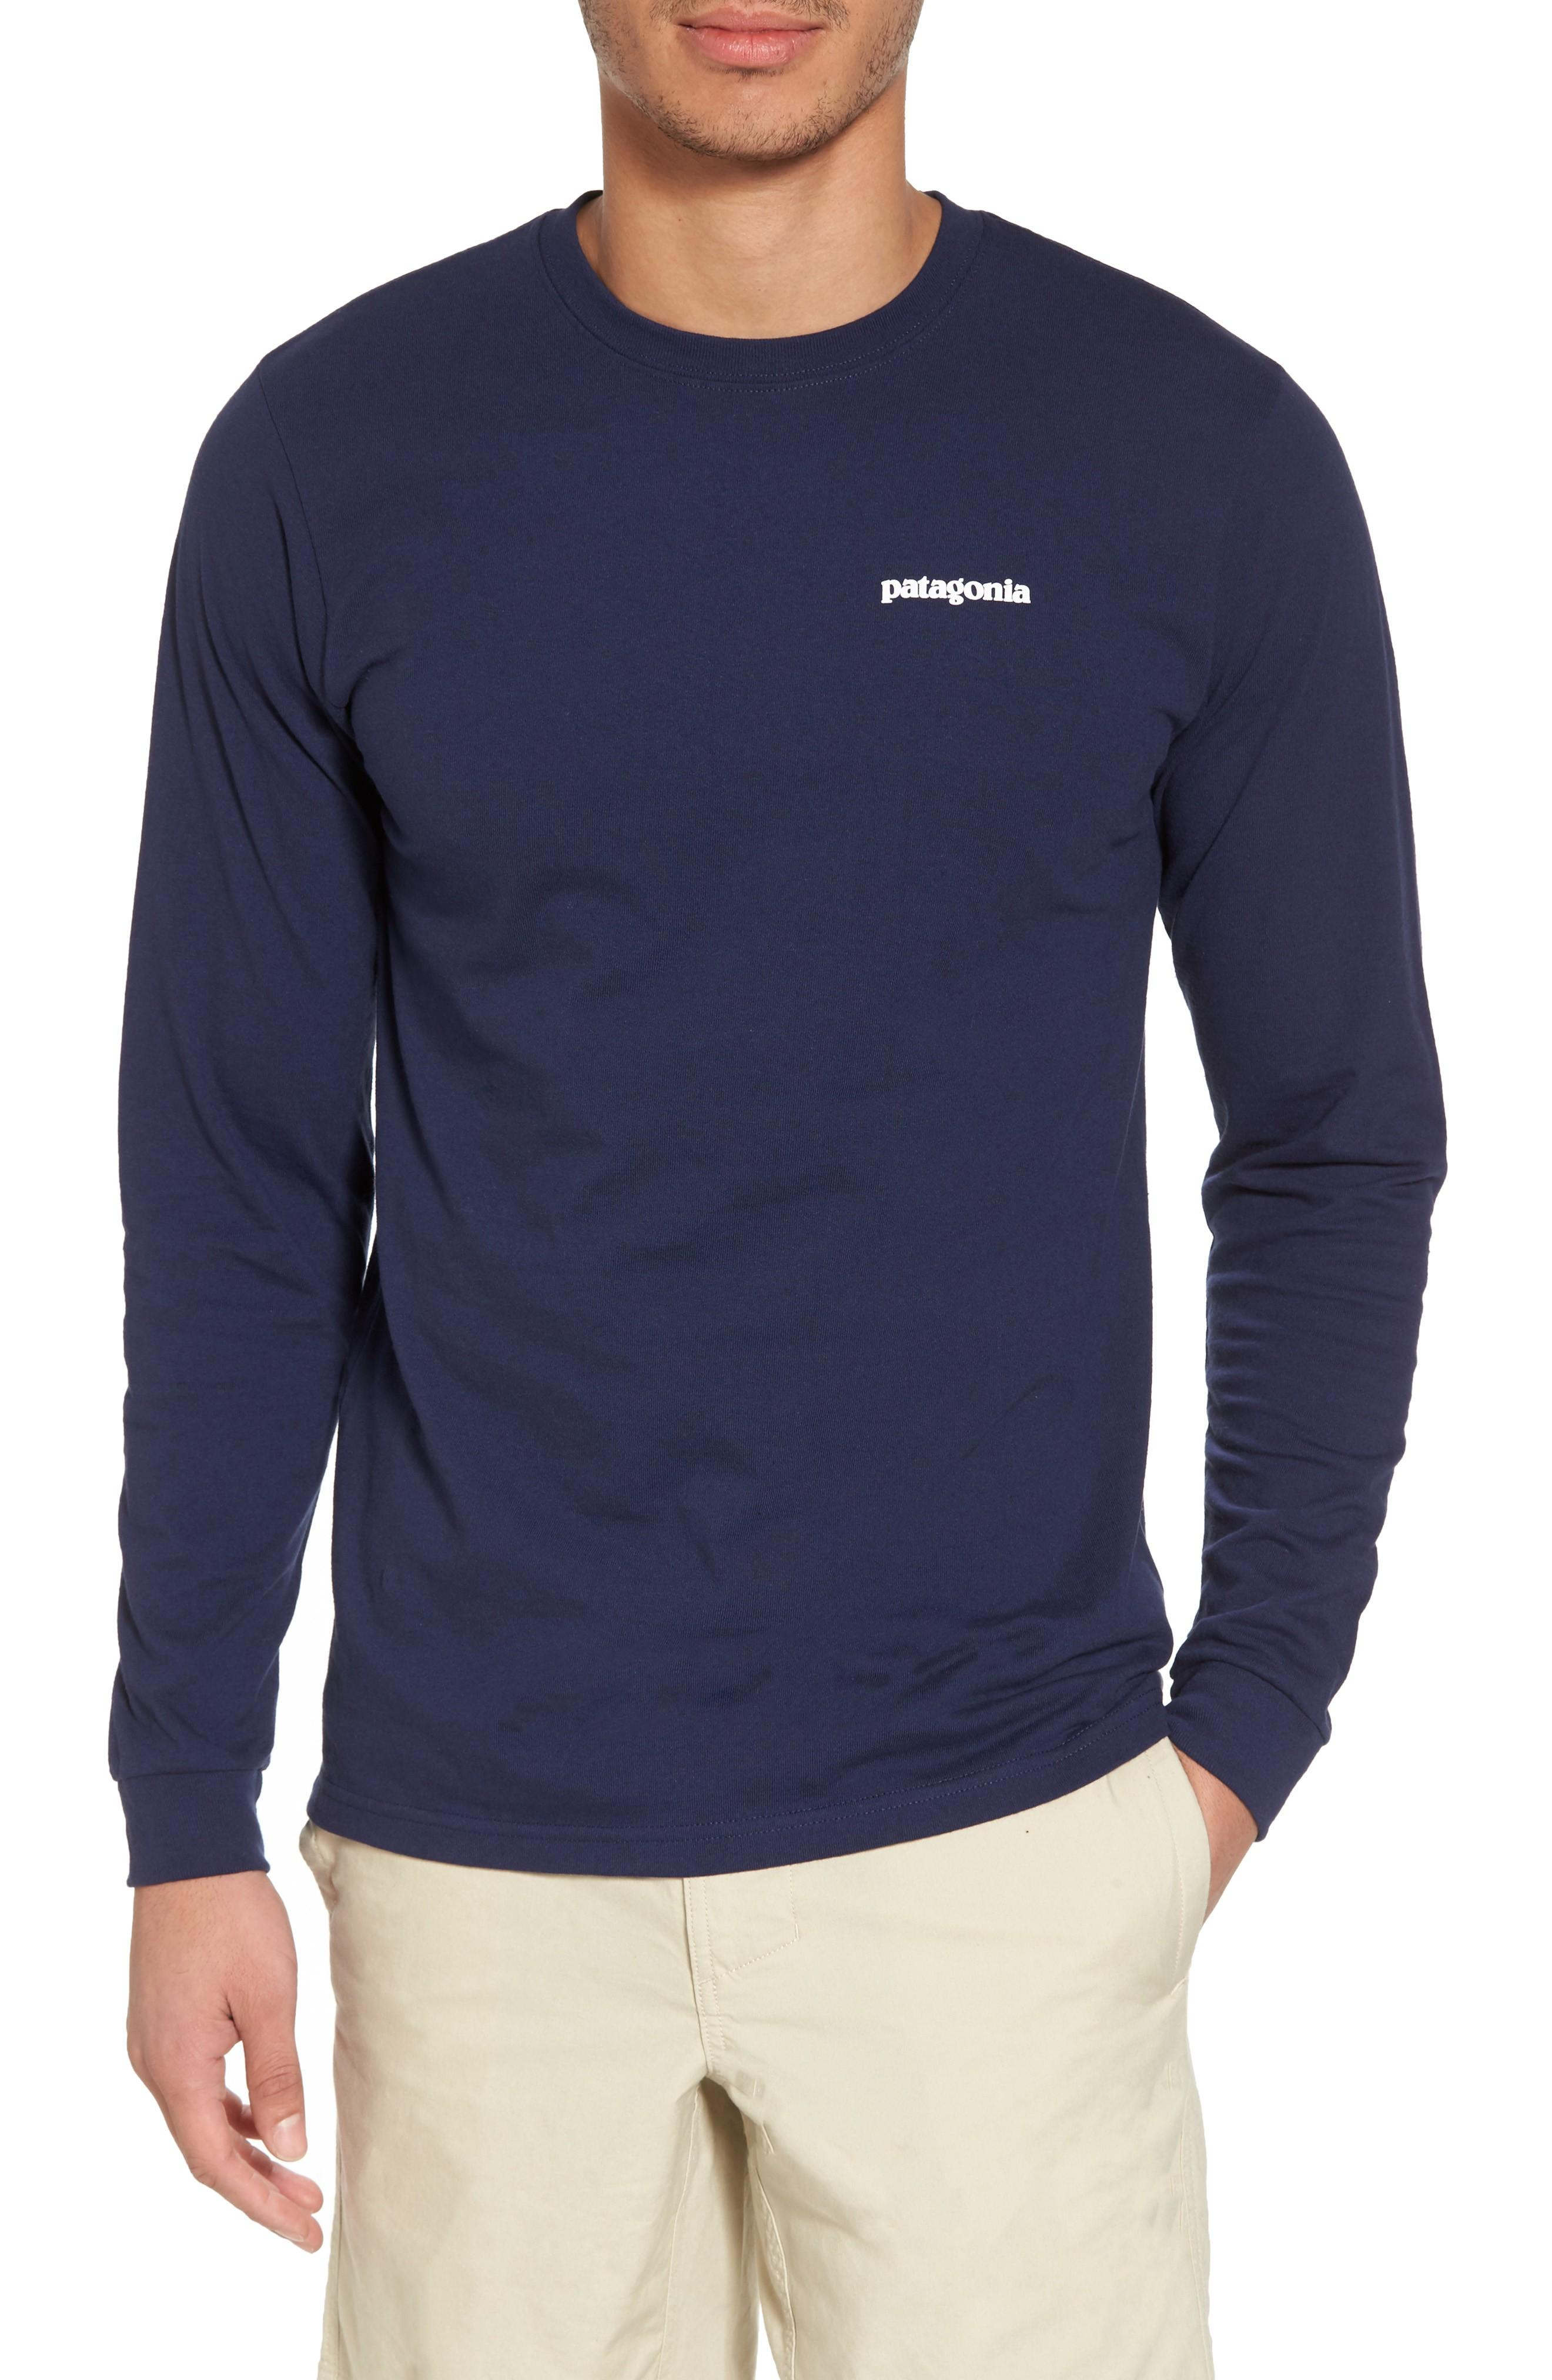 Patagonia Responsibili-Tee Long Sleeve T-Shirt In Classic Navy